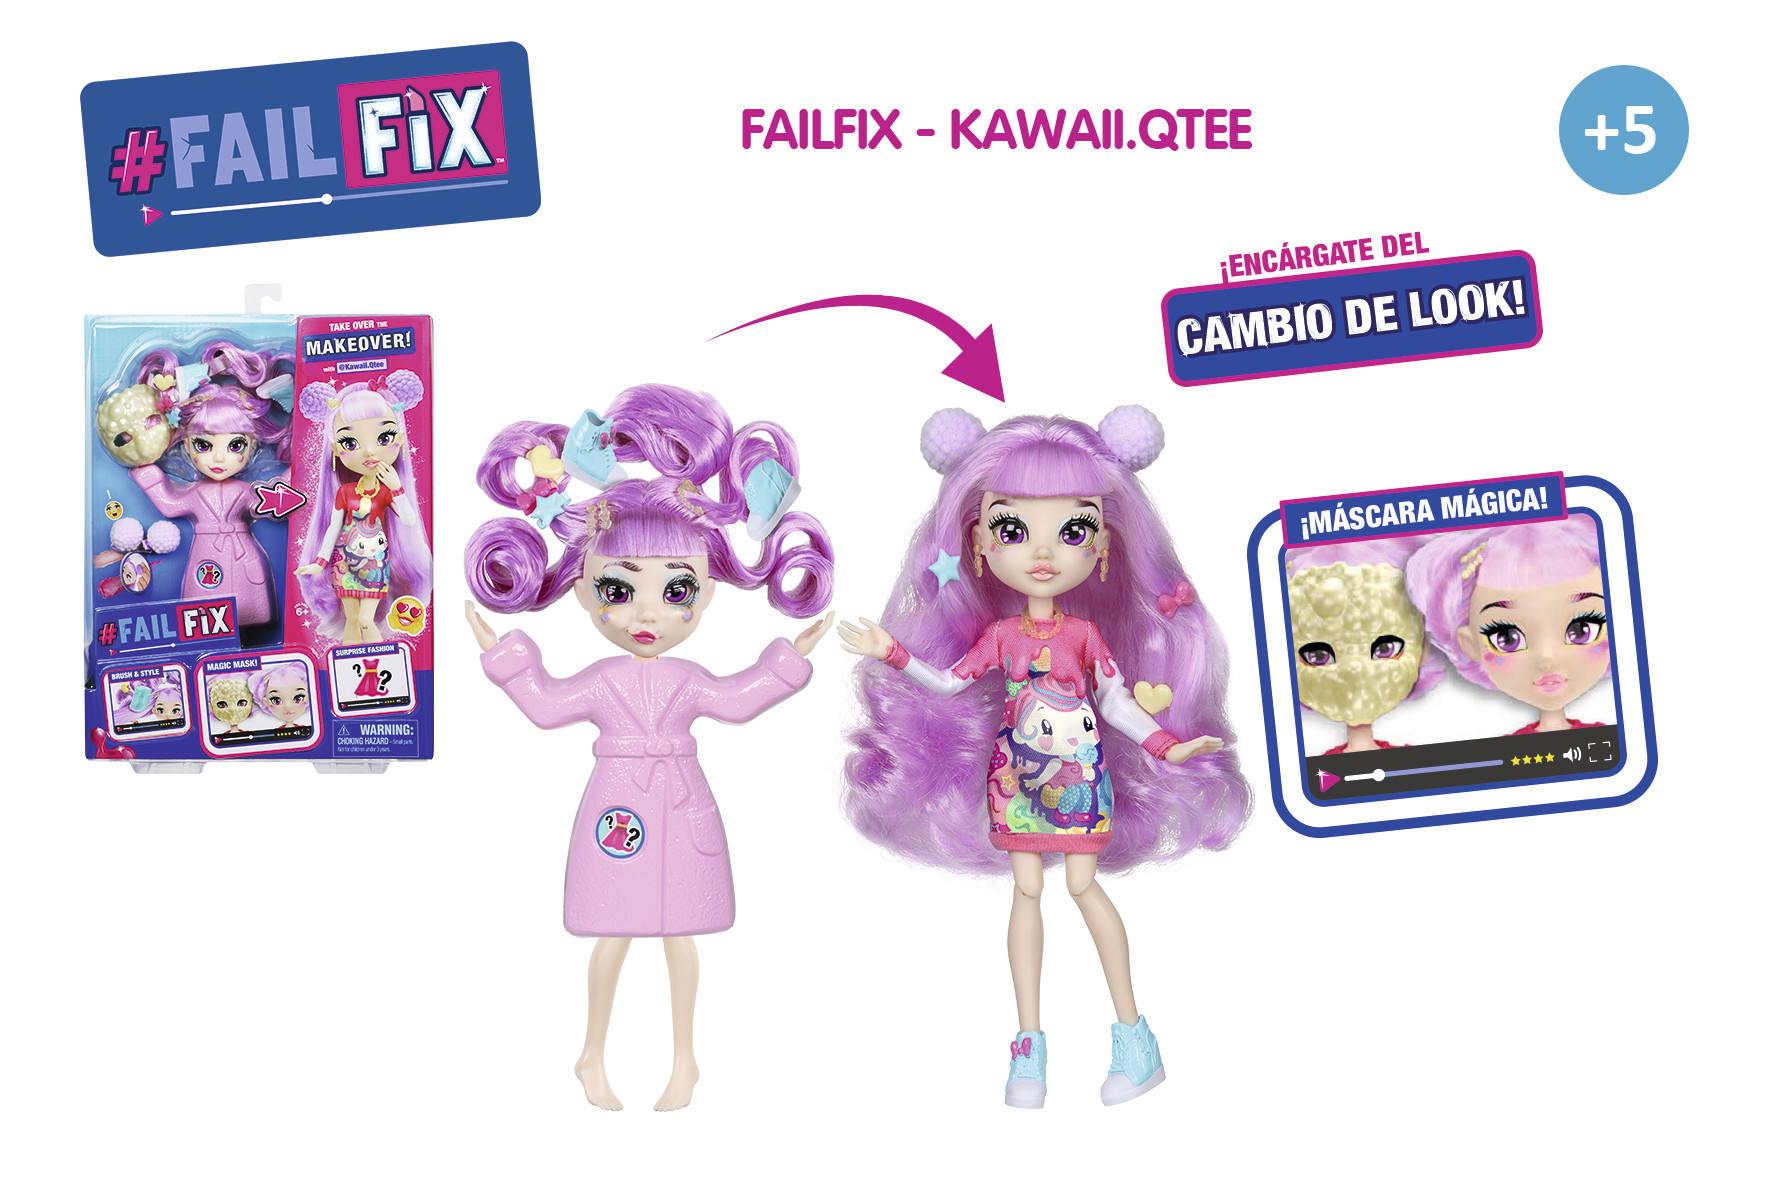 FAILFIX KAWAII CAMBIO DE LOOK 16073